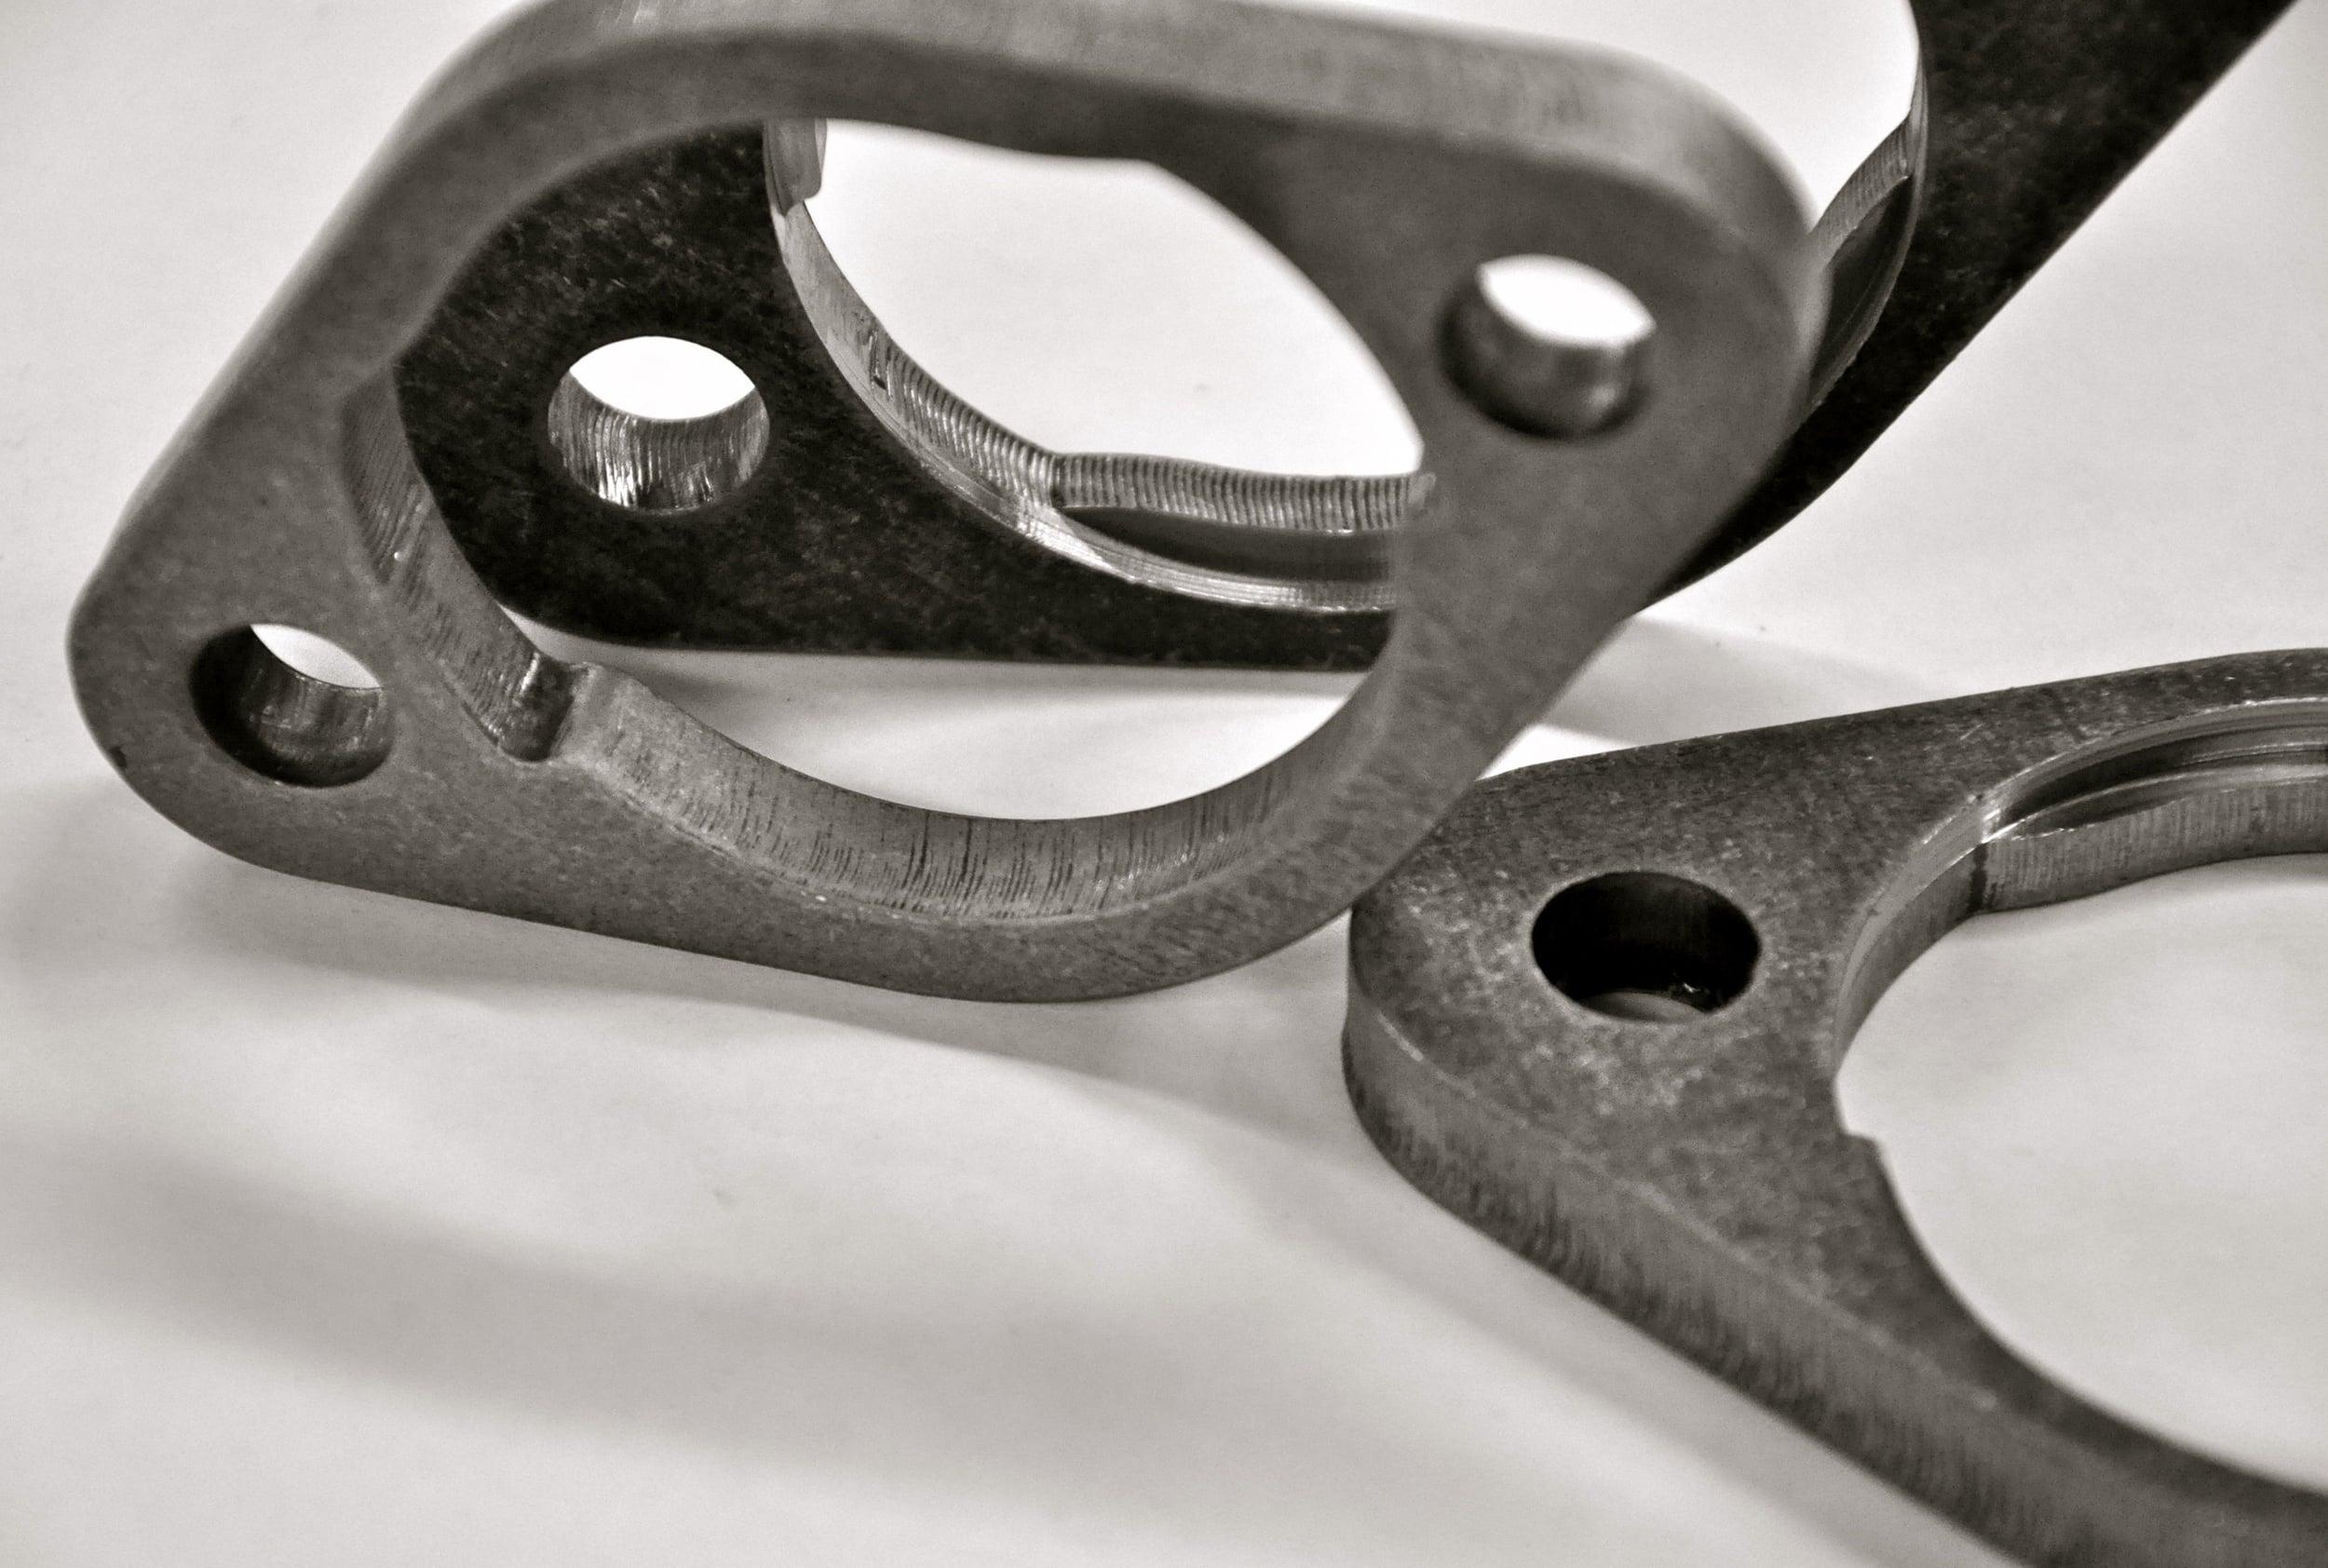 Laser & CNC Milled Part